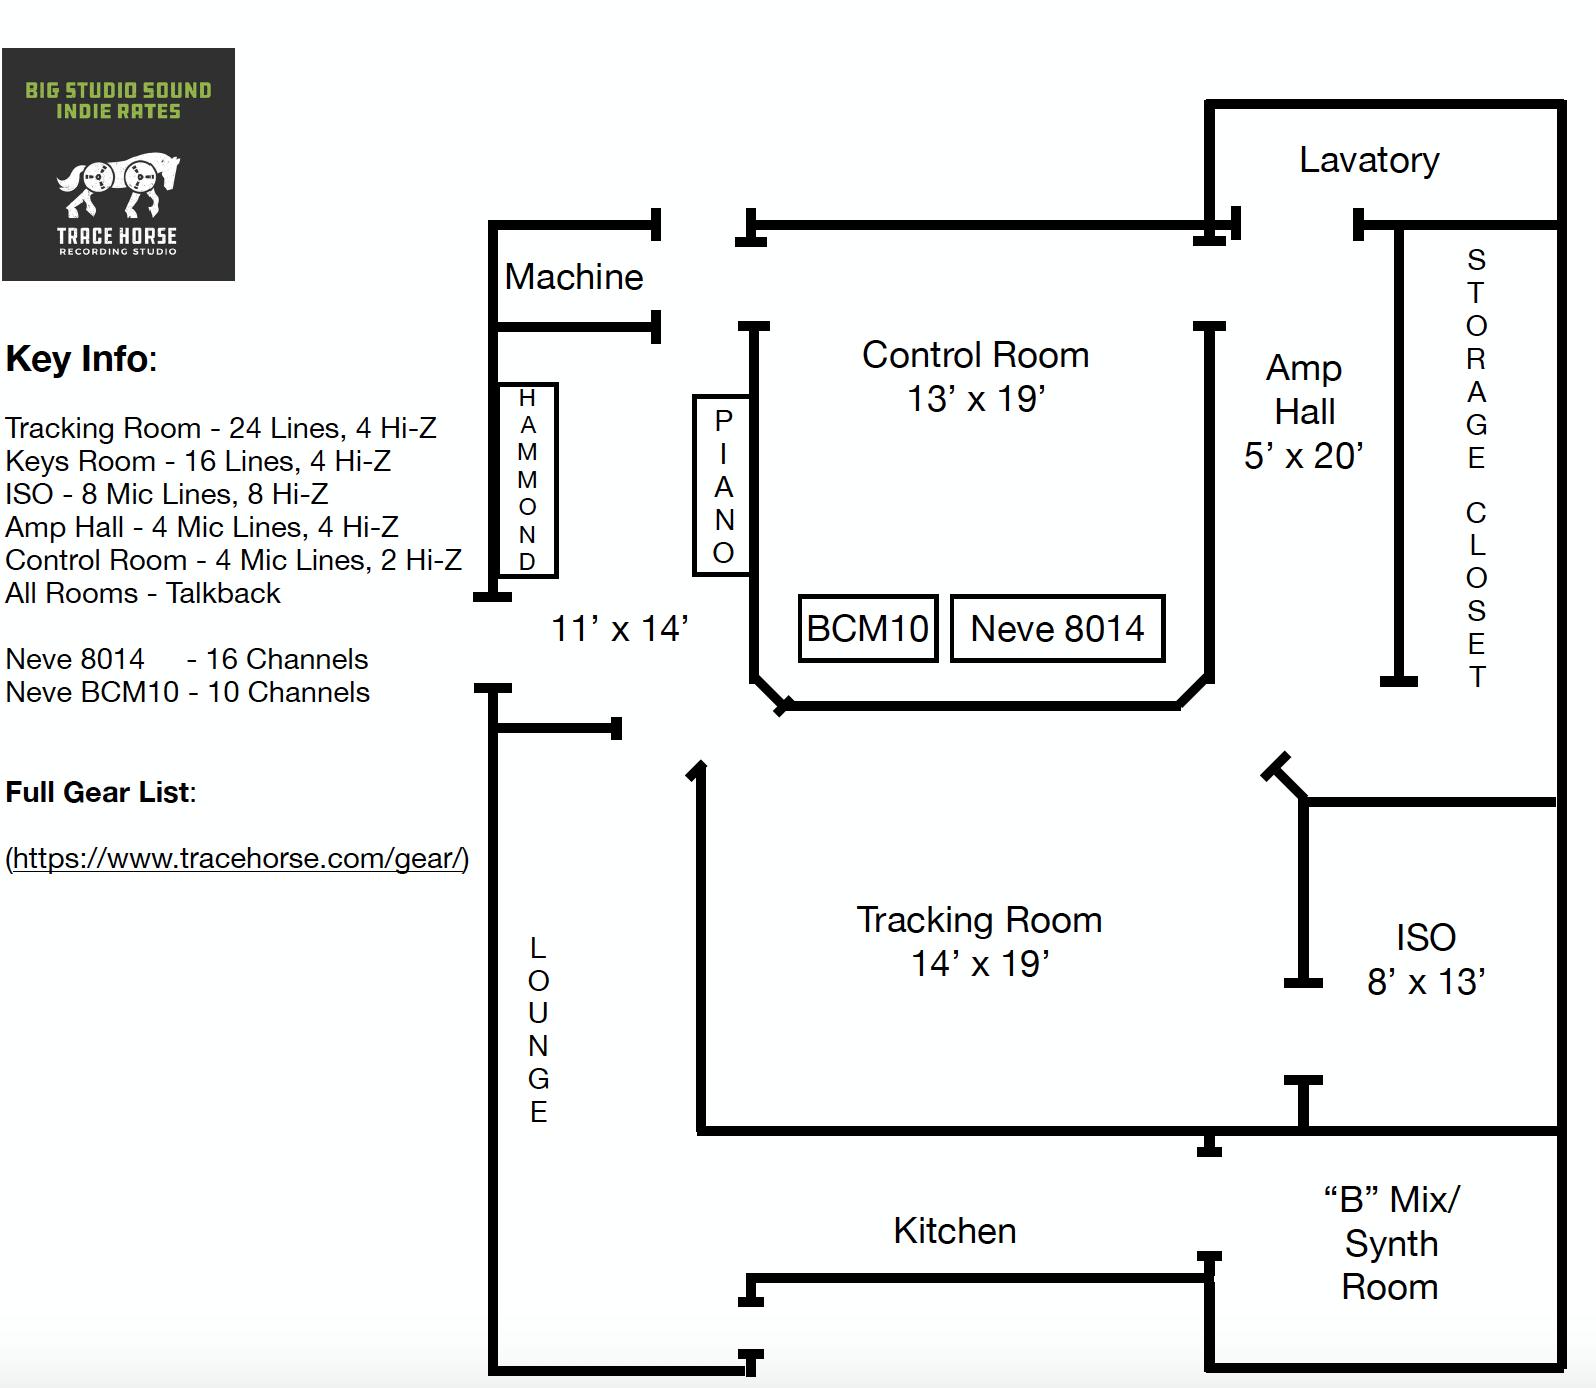 Studio Layout - Key Info